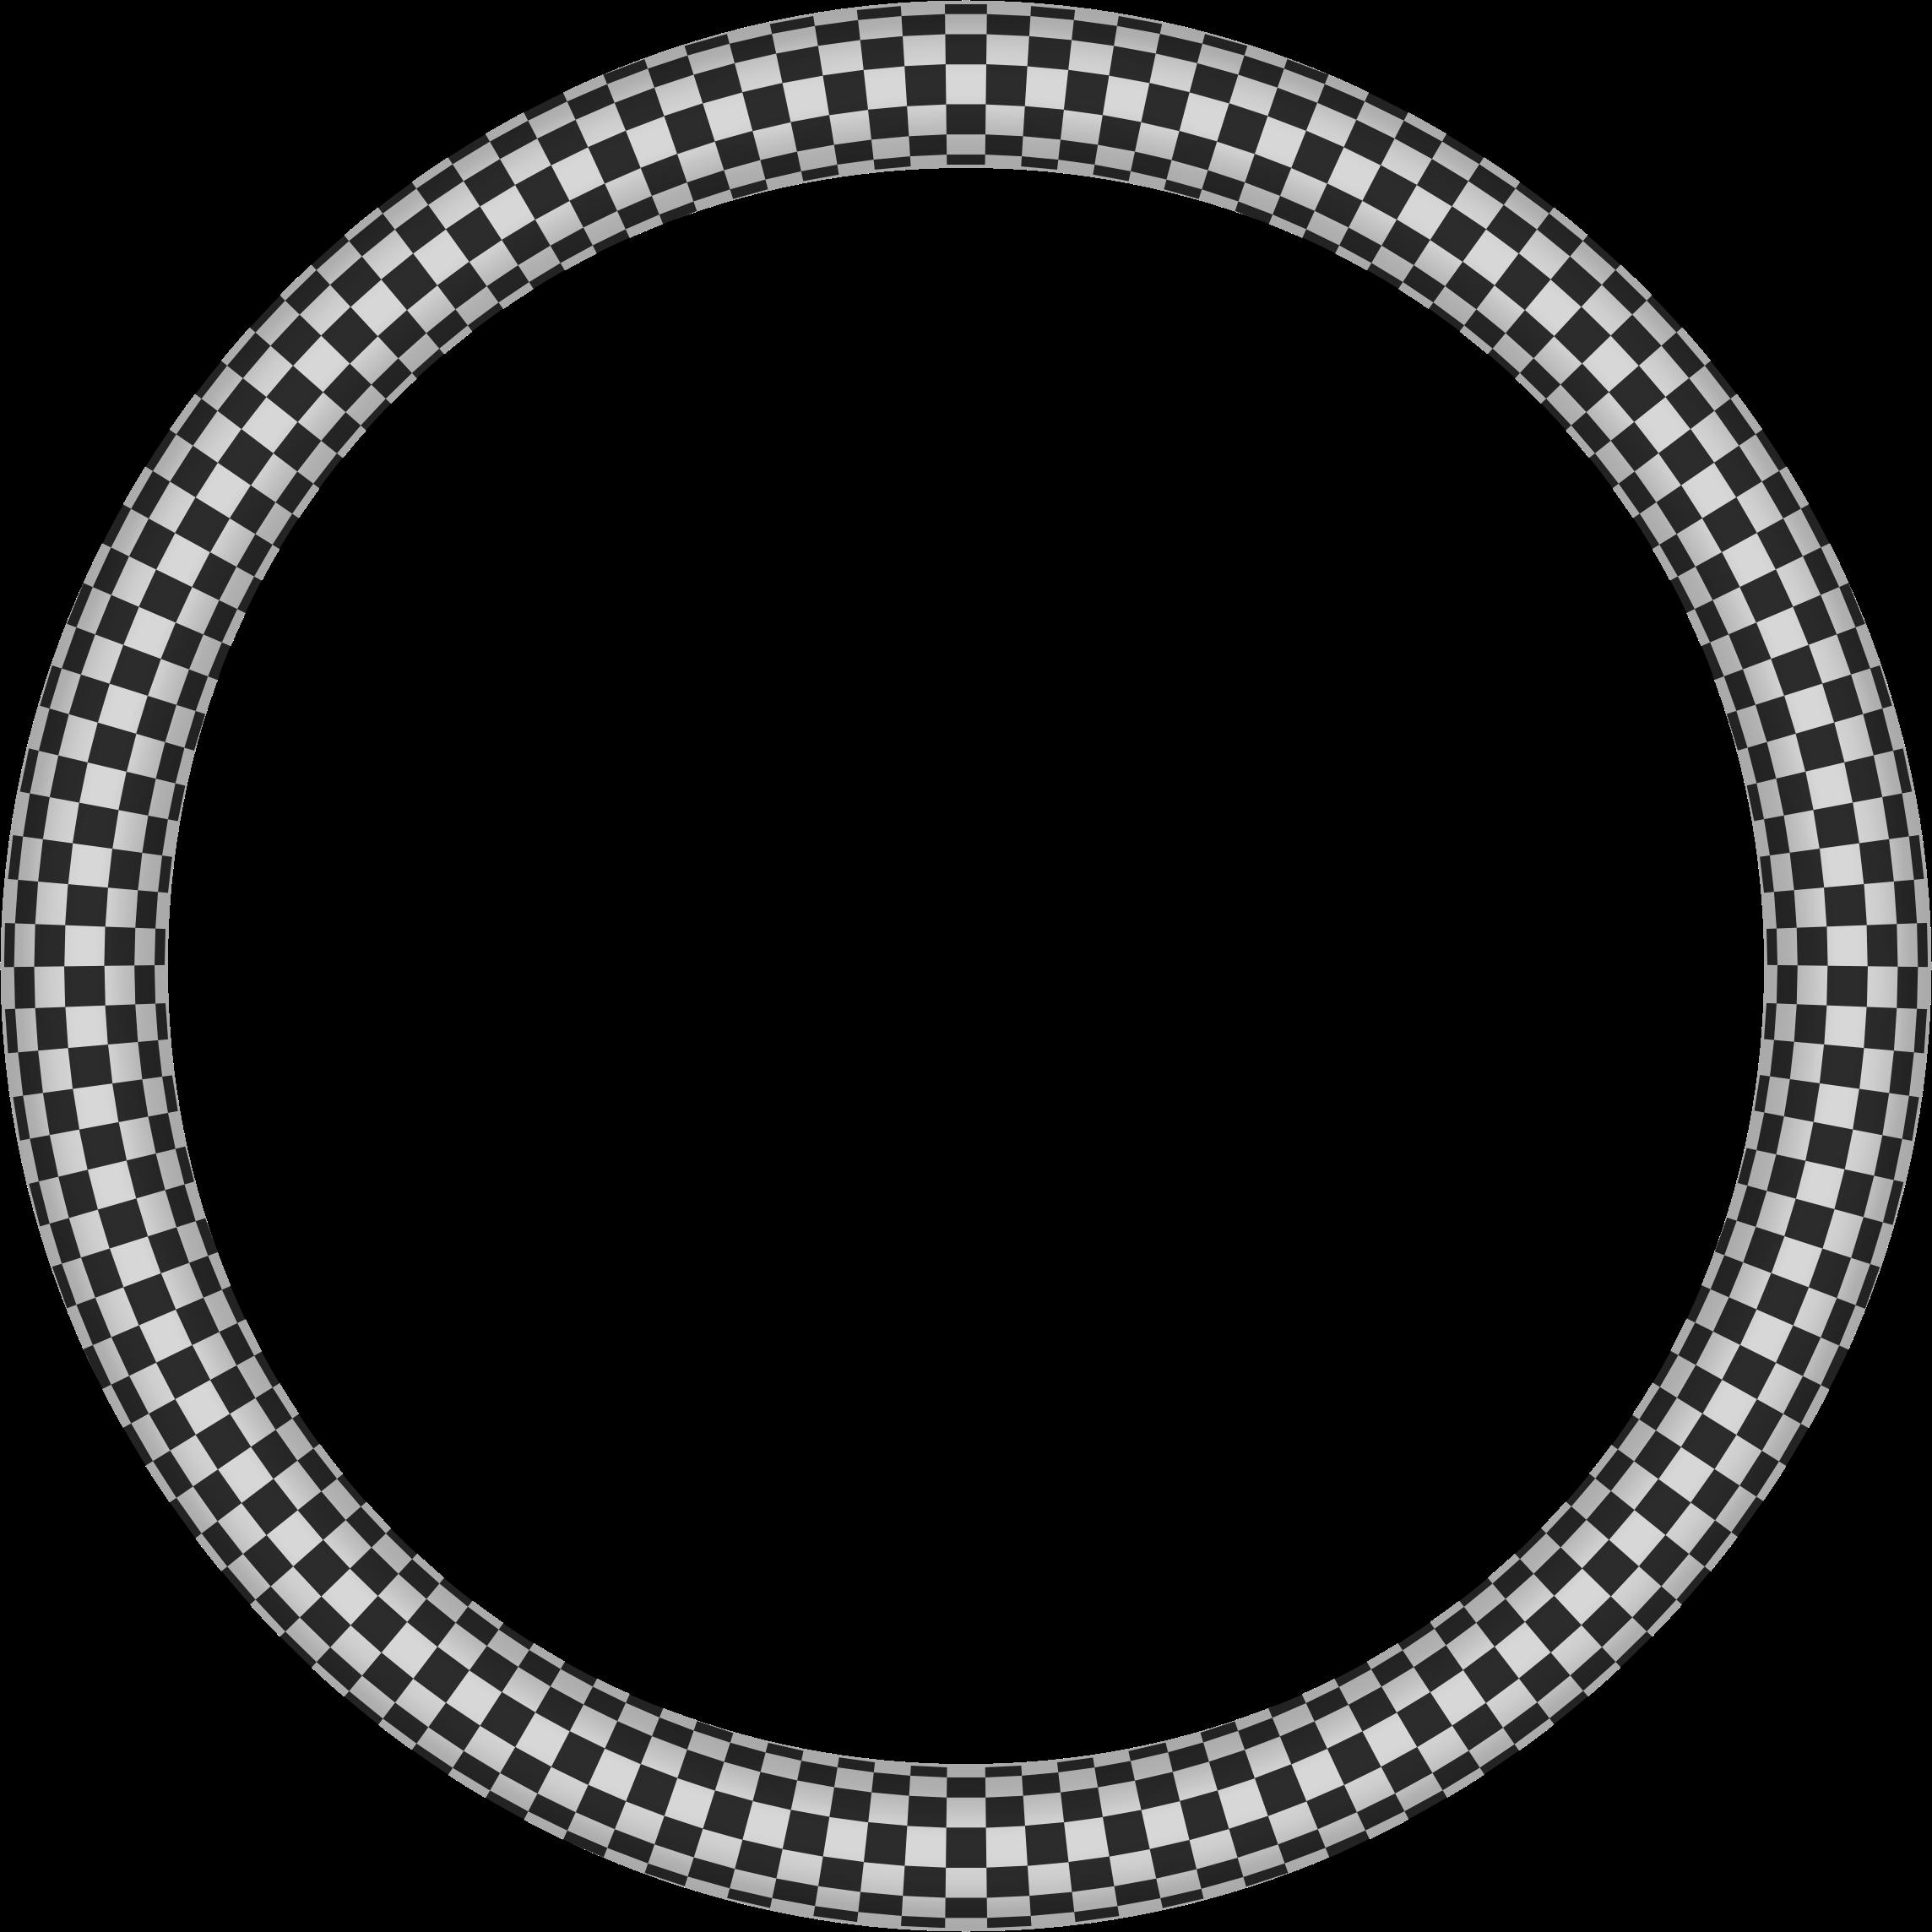 Opti check big image. Dot clipart round